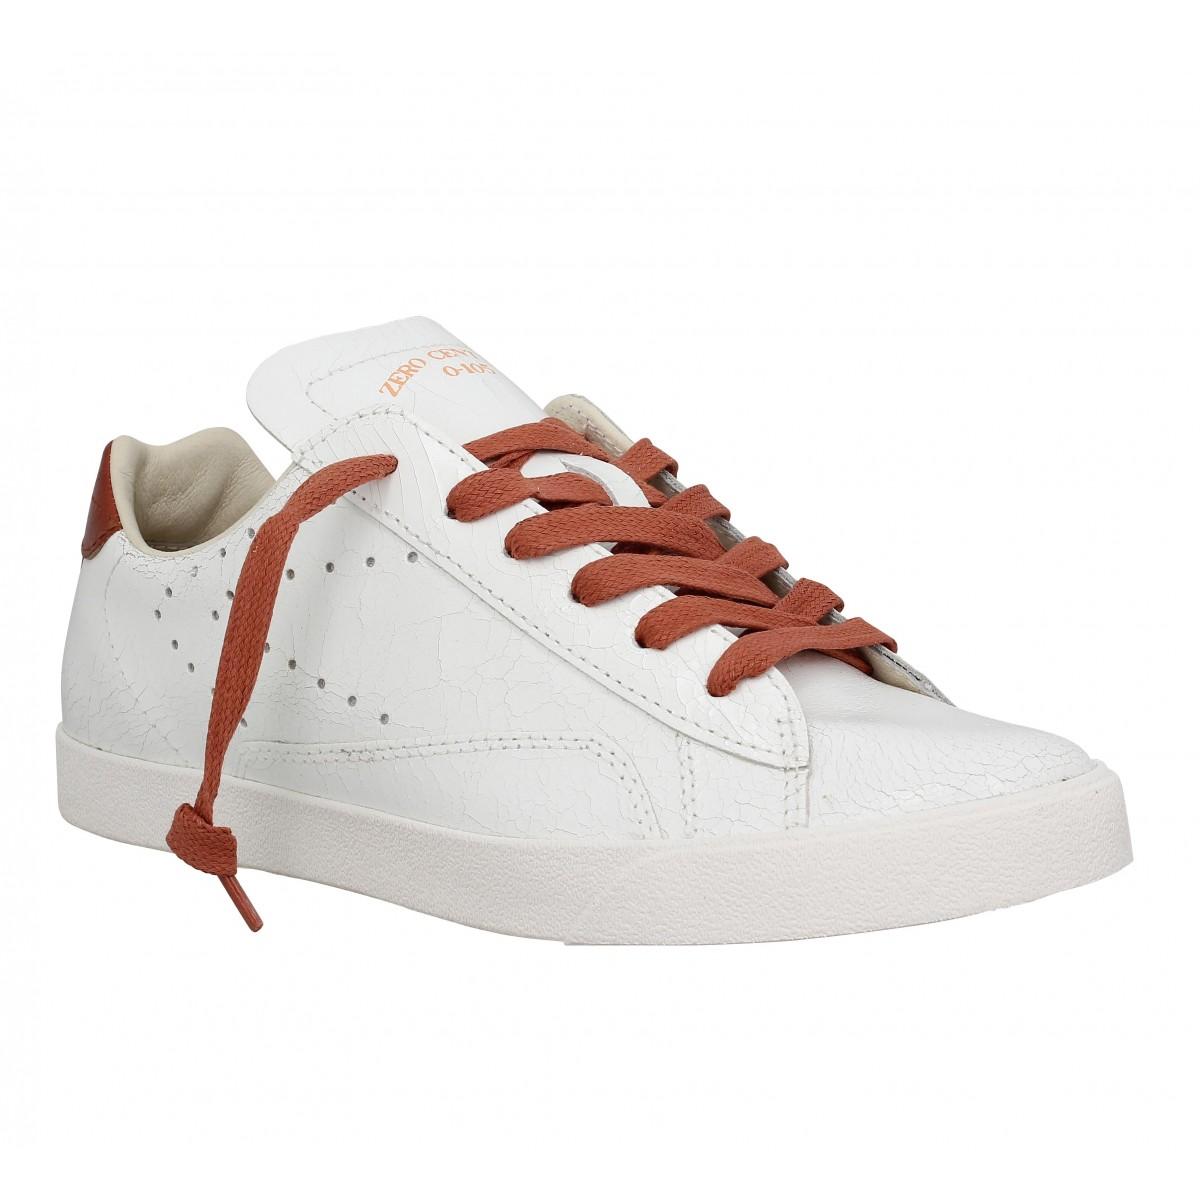 Baskets 0-105 Acsa cuir Femme Blanc